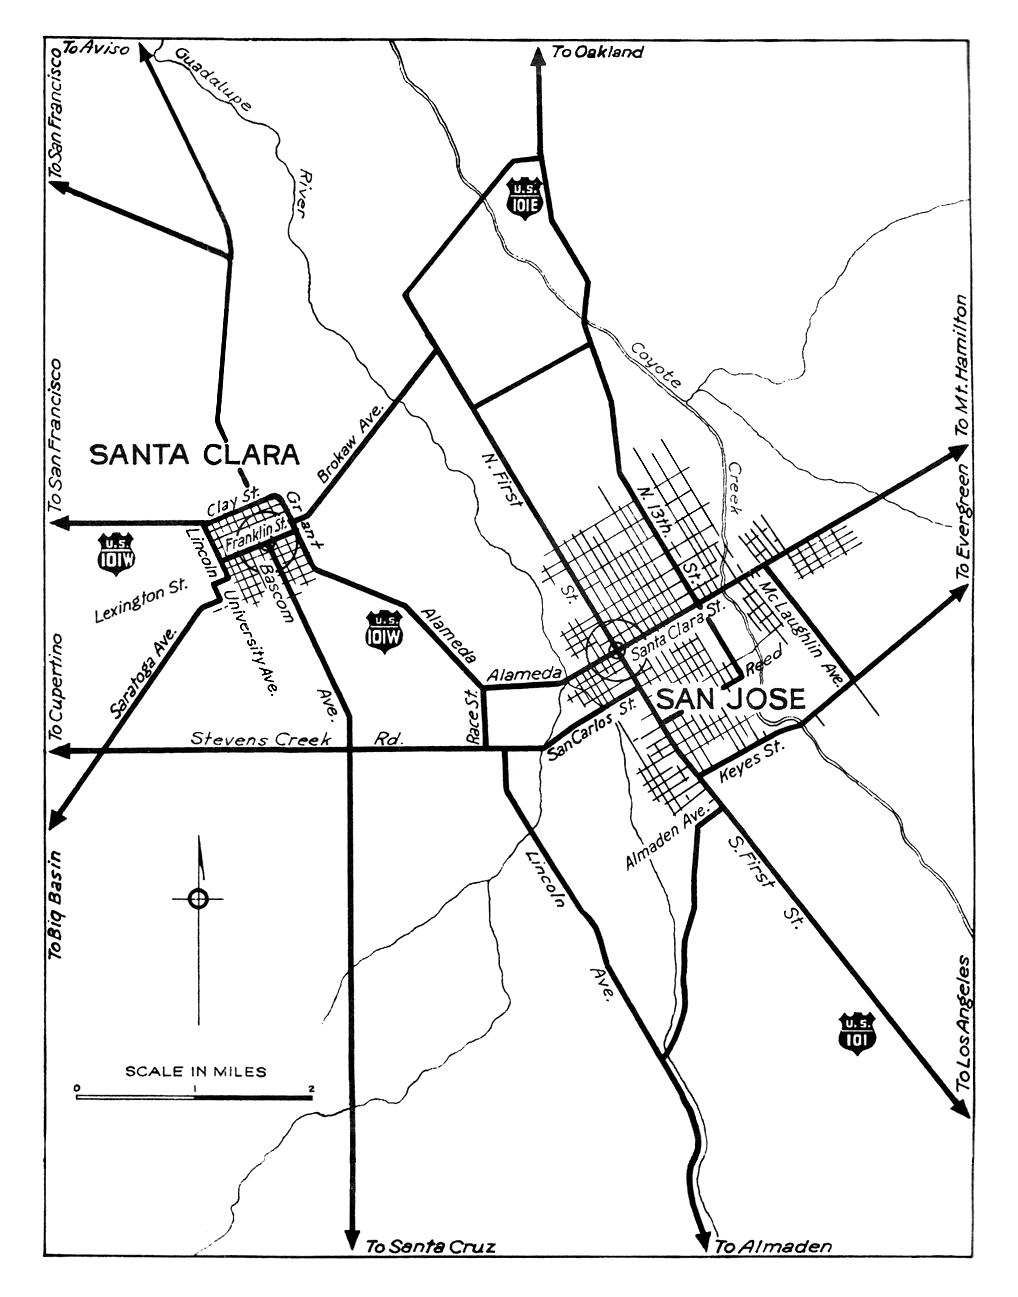 California City Maps At AmericanRoadscom - Us highway map 1940